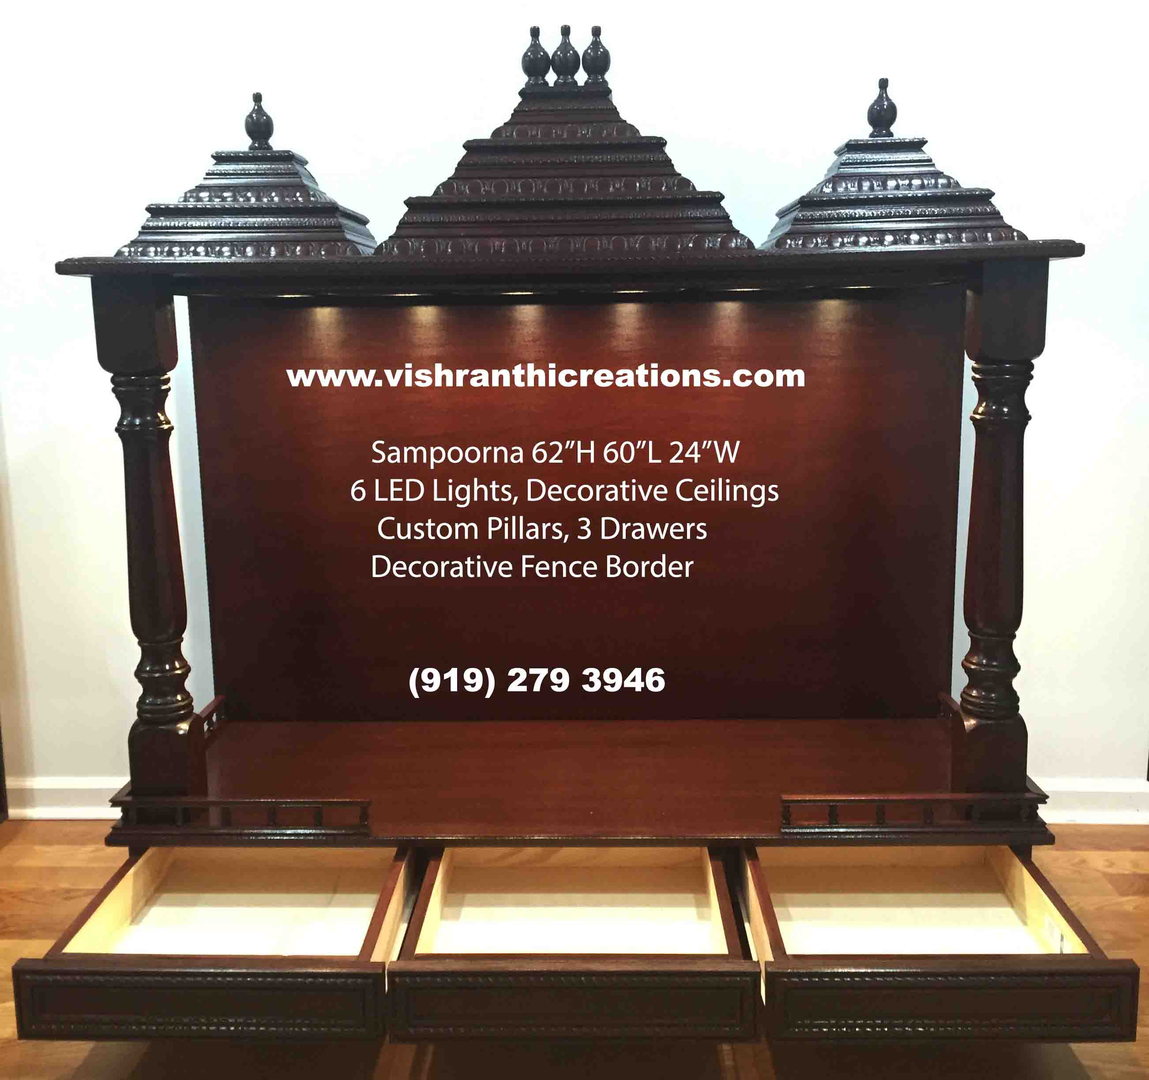 Wooden Pooja Mandir in USA by Vishranthi Creations